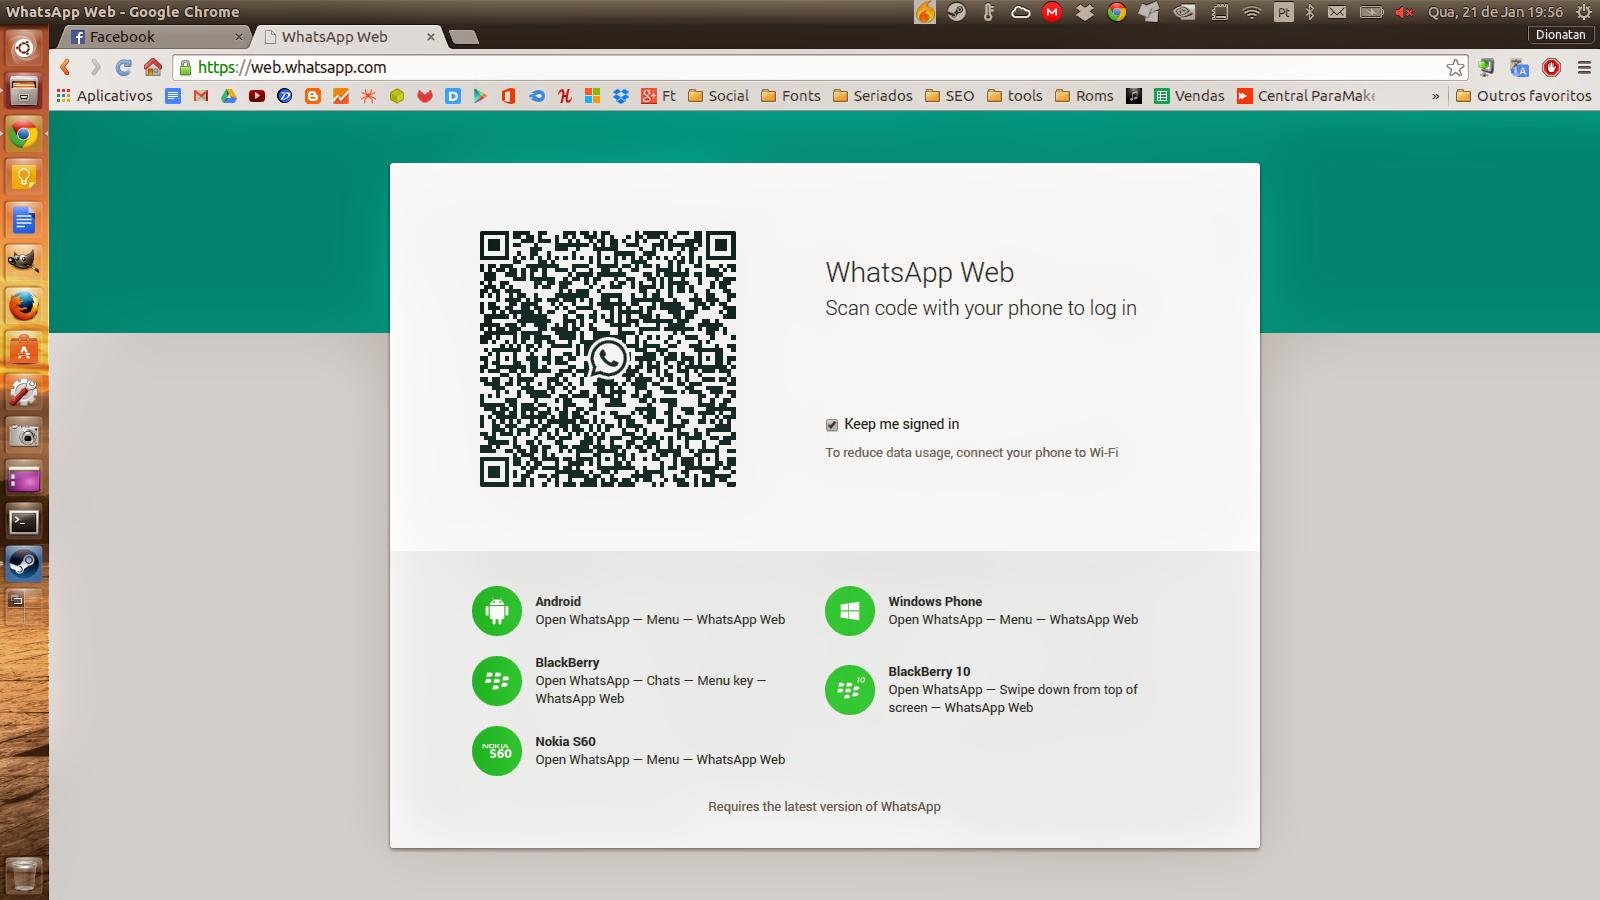 Acessando o WhatsApp pela web